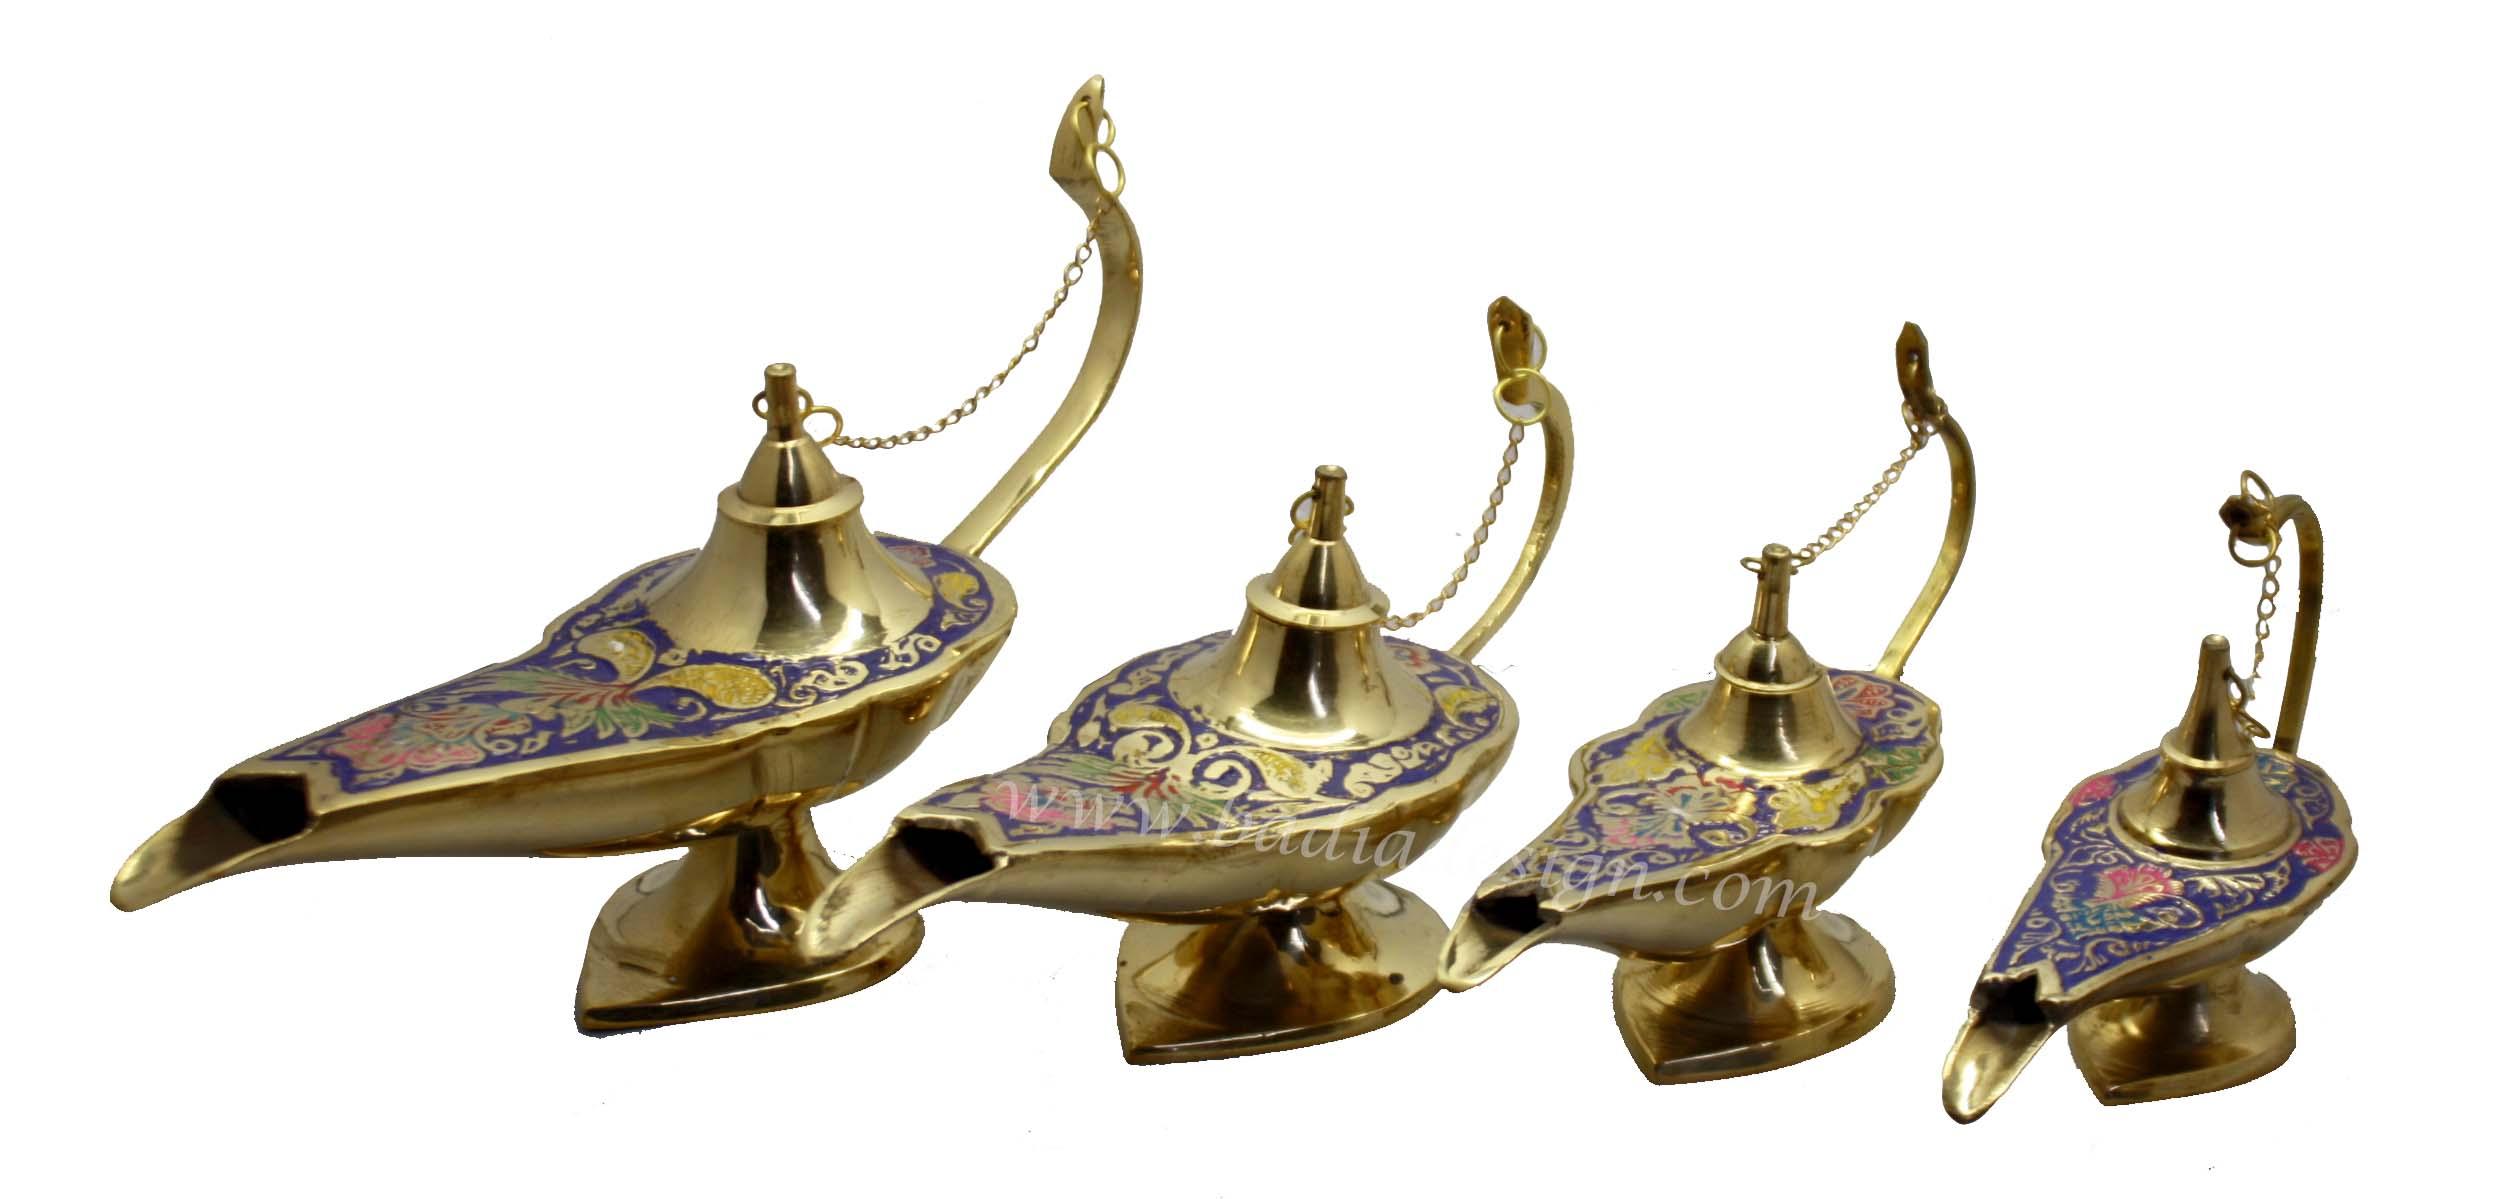 moroccan-brass-aladdin-genie-lamp-hd173-1.jpg